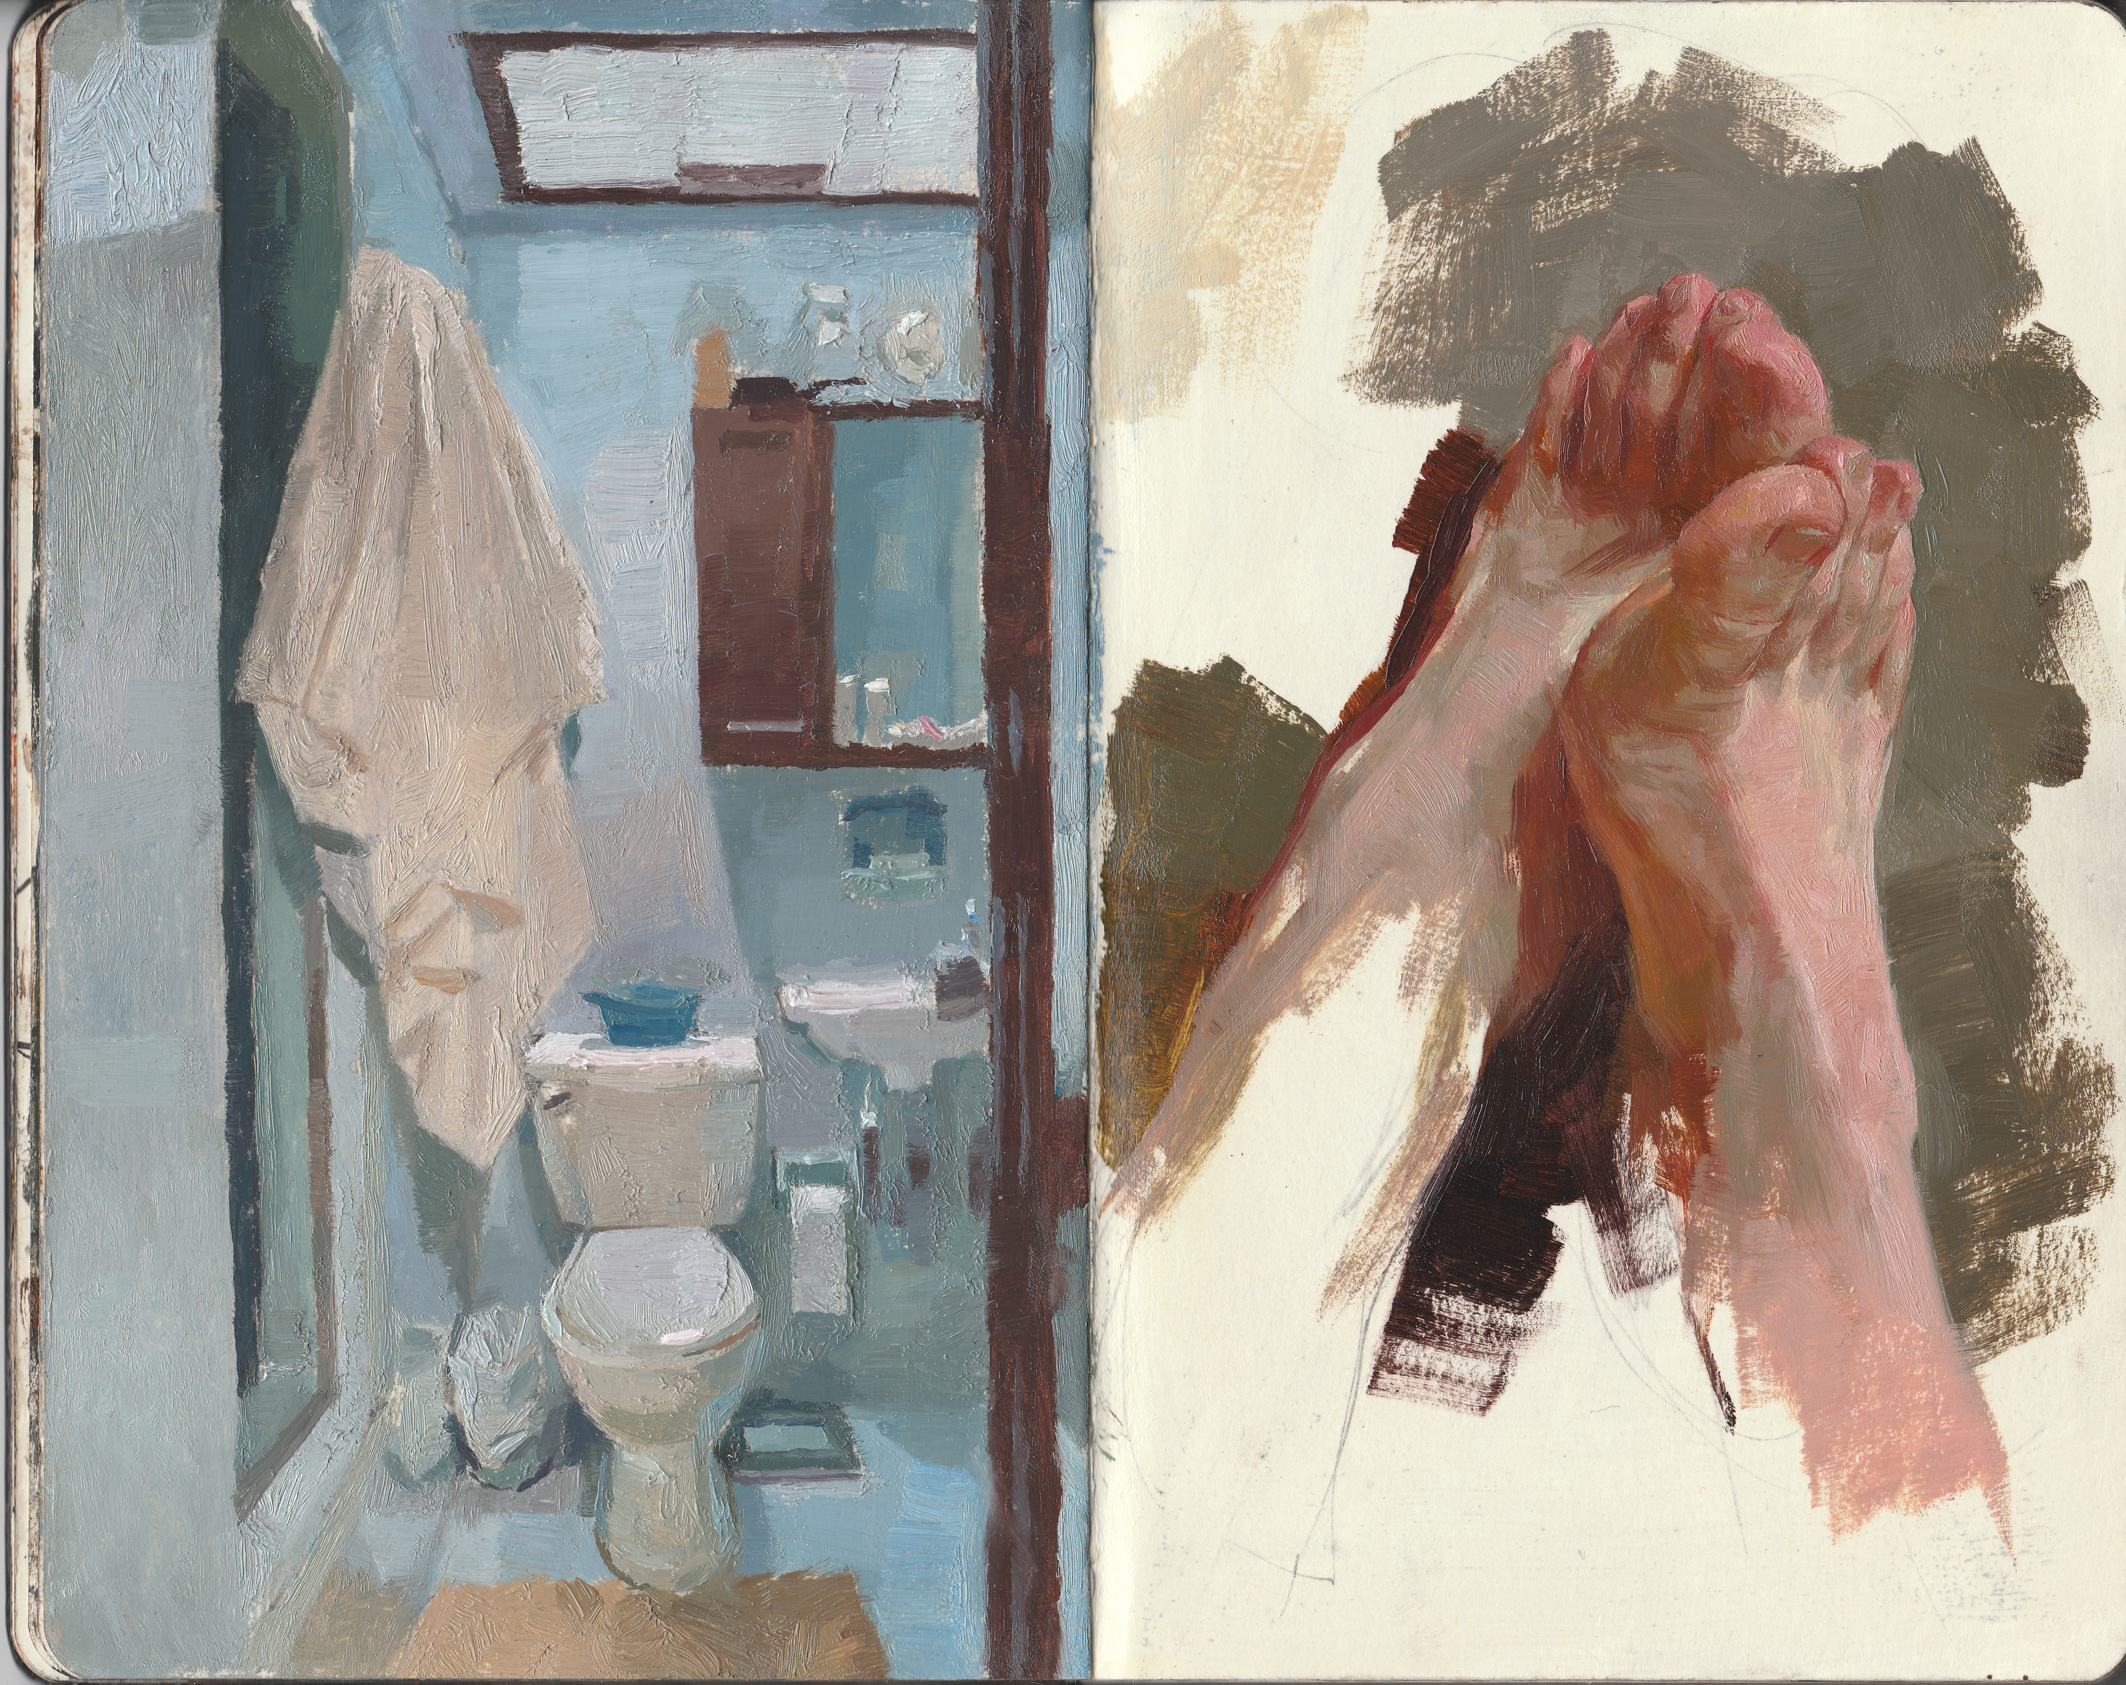 Bathroom and Feet